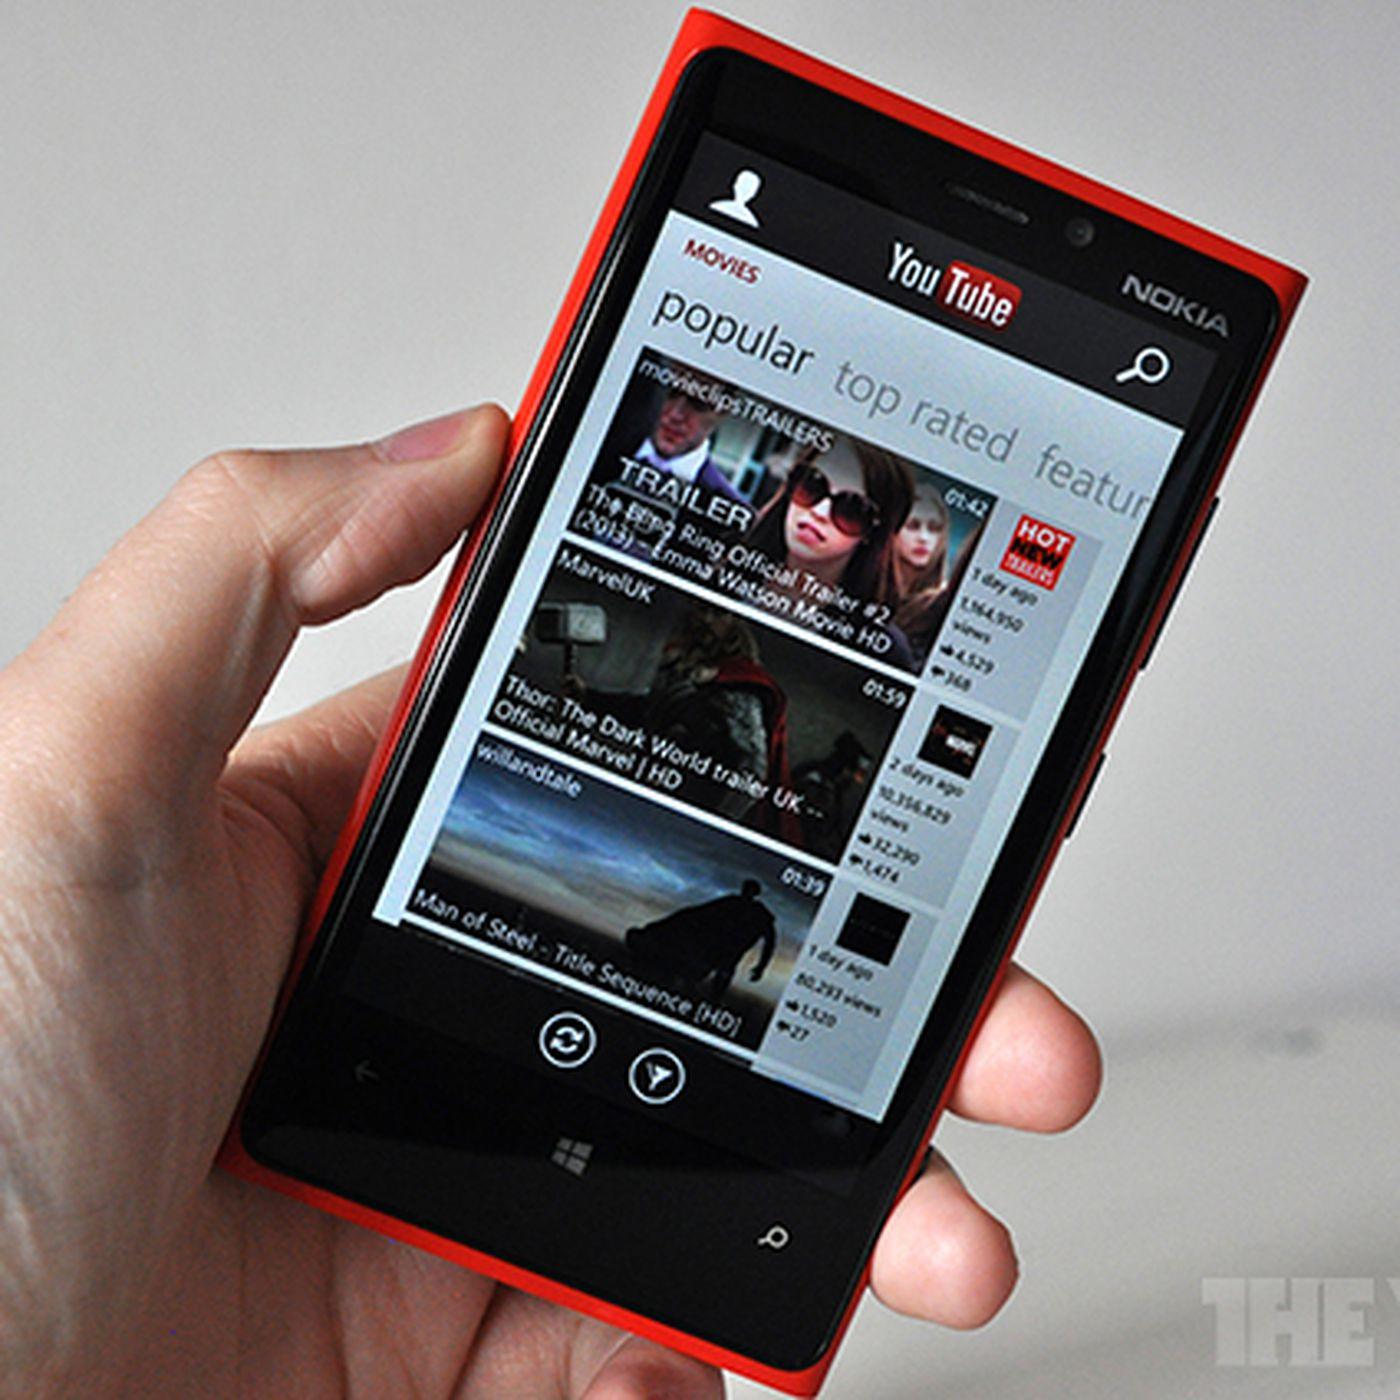 Branchement Apps Windows Phone Ouran Highschool club hôte rencontres quiz